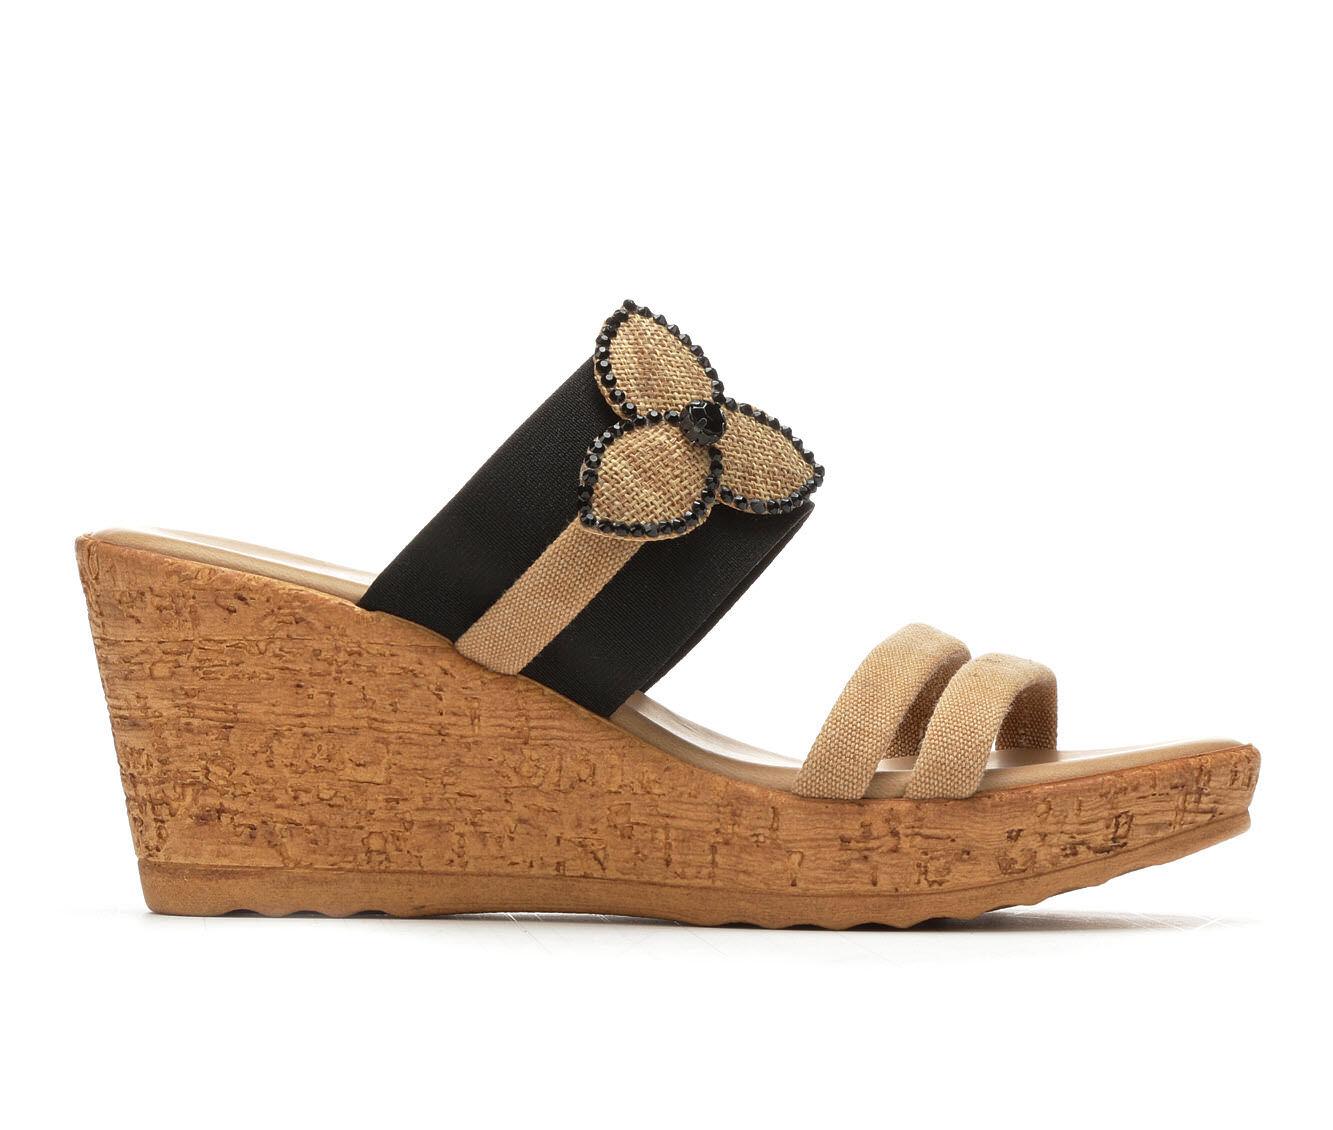 buy cheap best seller discount affordable Women's Italian Shoemakers Seek Wedge Sandals discount for sale e8E3kA